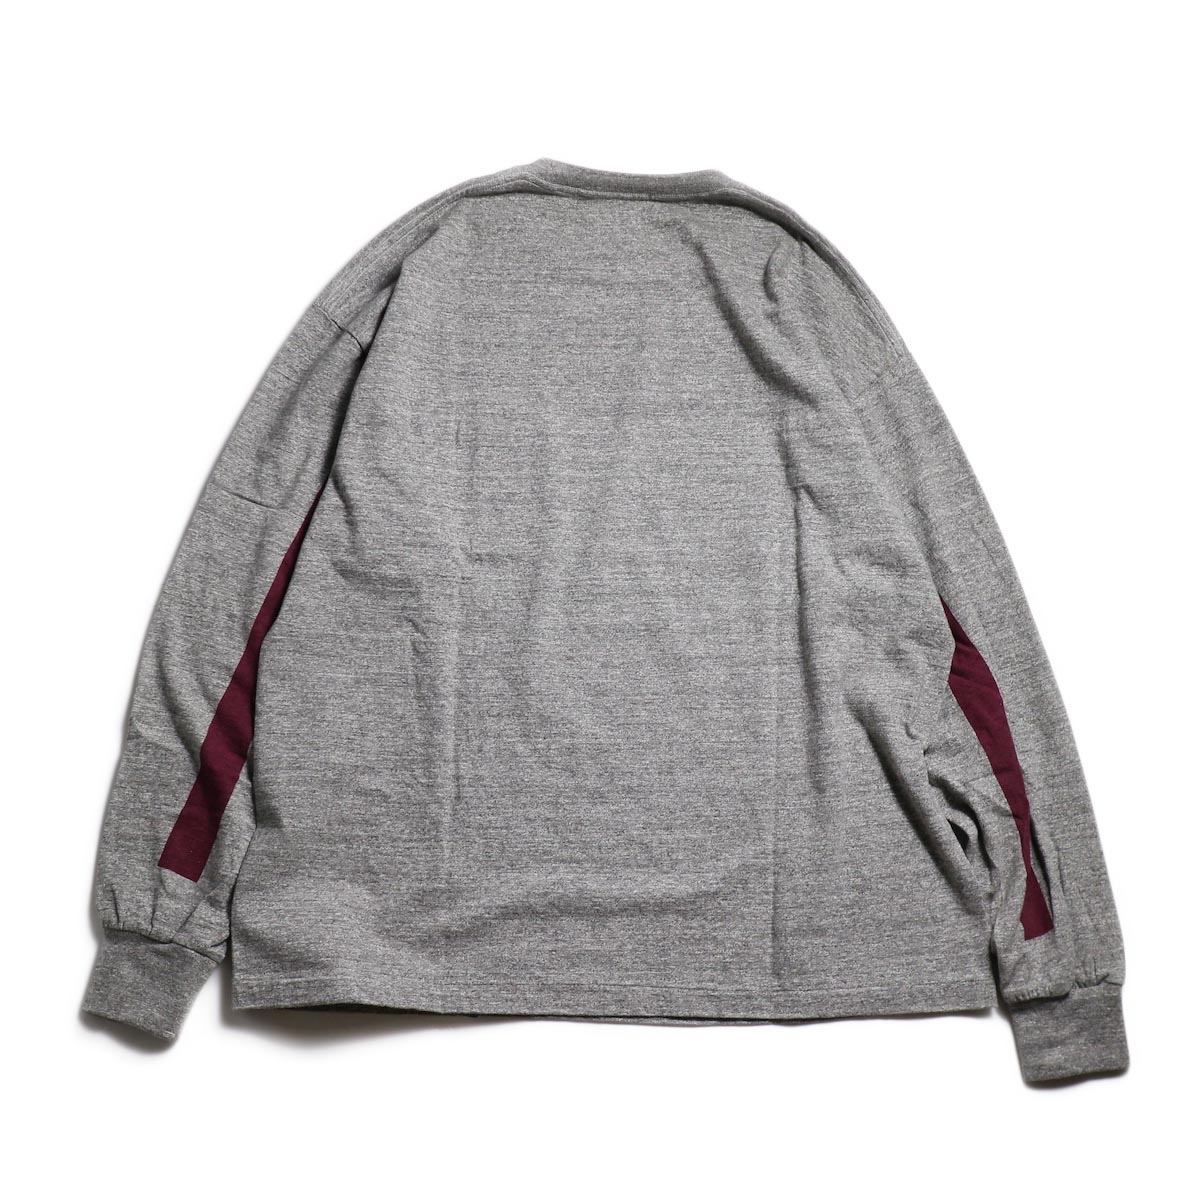 Kaptain Sunshine / West Coast L/S Tee -Feather Grey × Burgundy Line 背面